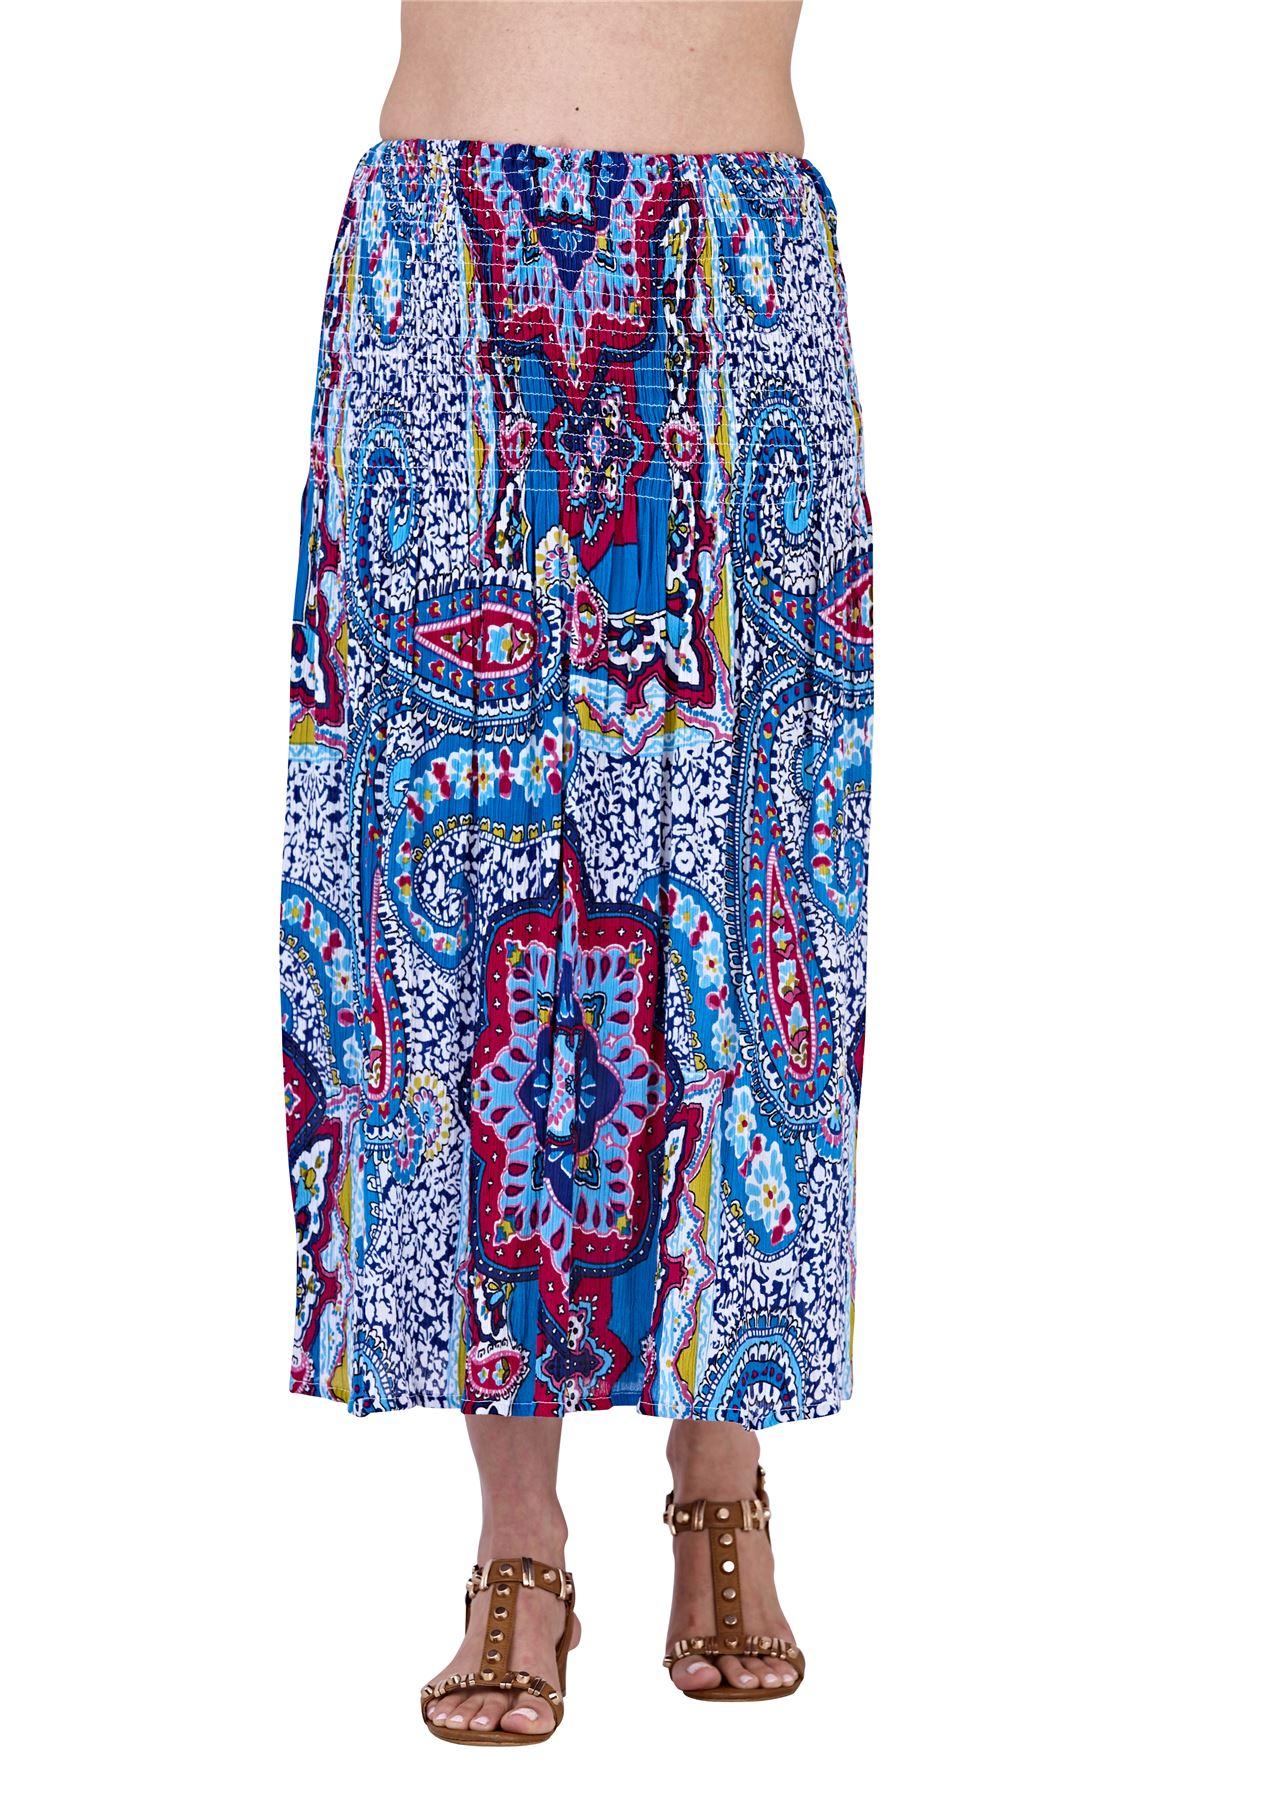 Ladies-Pistachio-Viscose-3-Way-Halter-Bandeau-Skirt-Summer-Beach-Dresses thumbnail 4